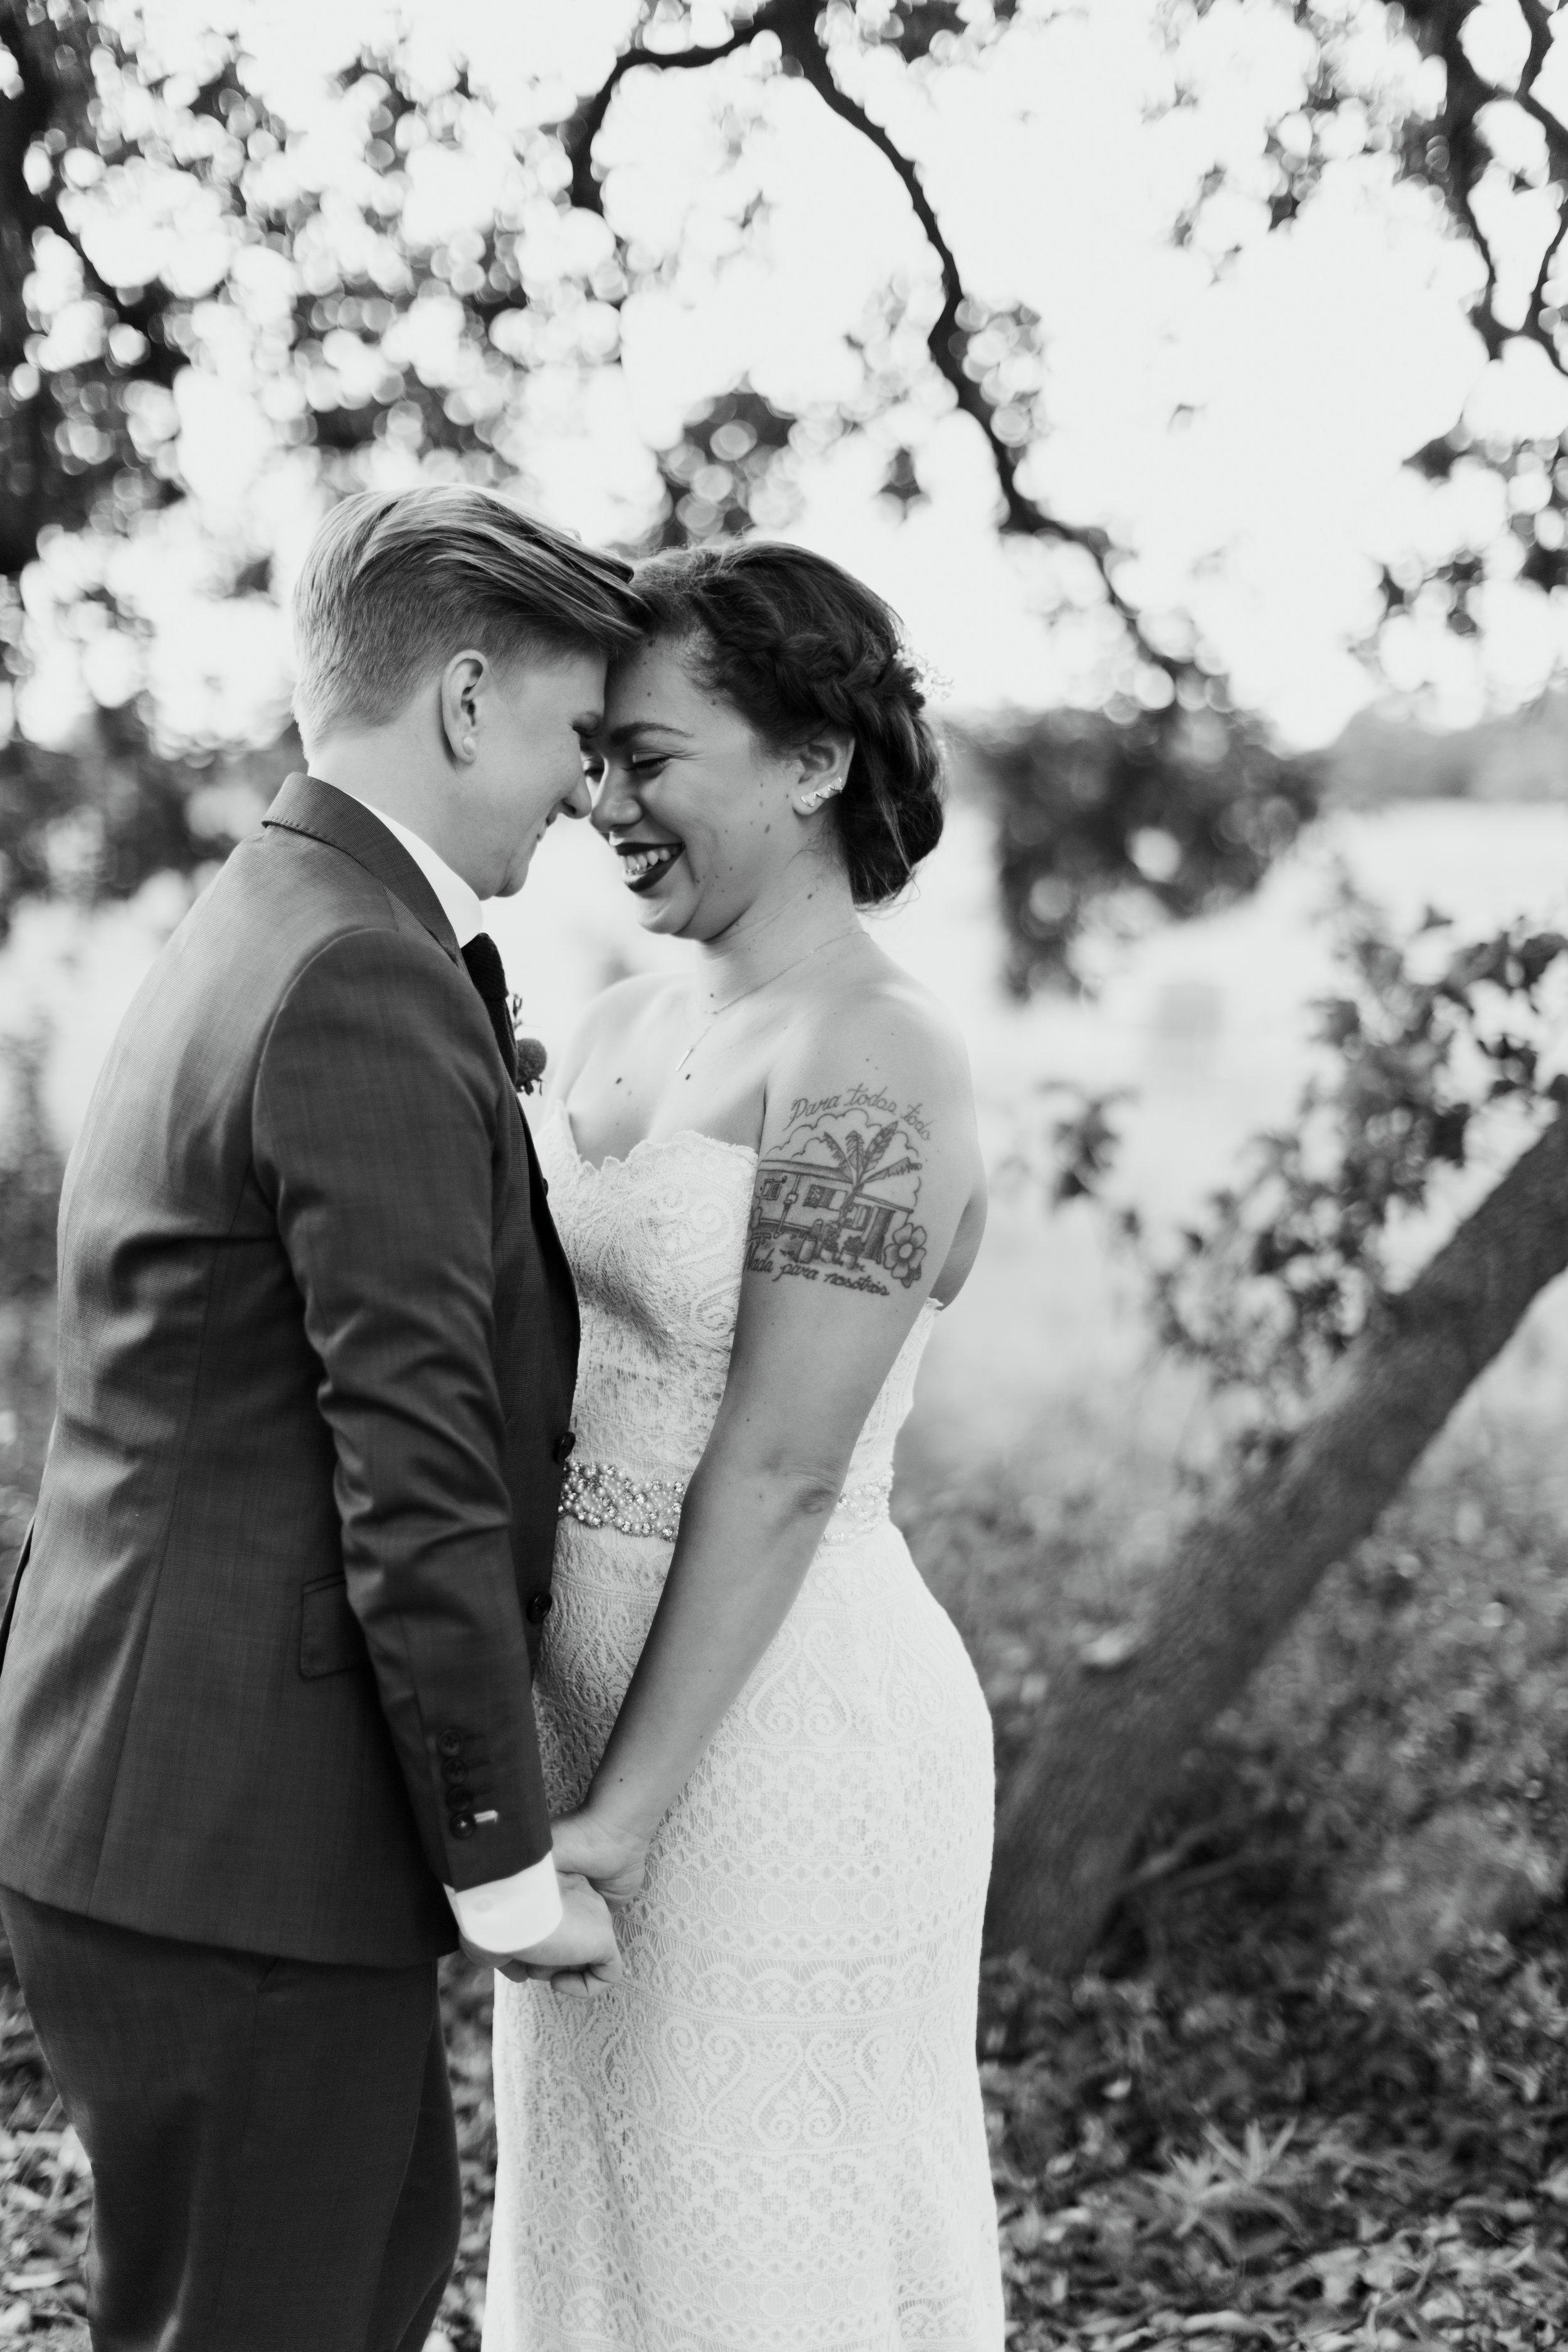 Paige-Newton-Destination-Wedding-Photography-Prospect-House-Same-Sex-Wedding.jpg